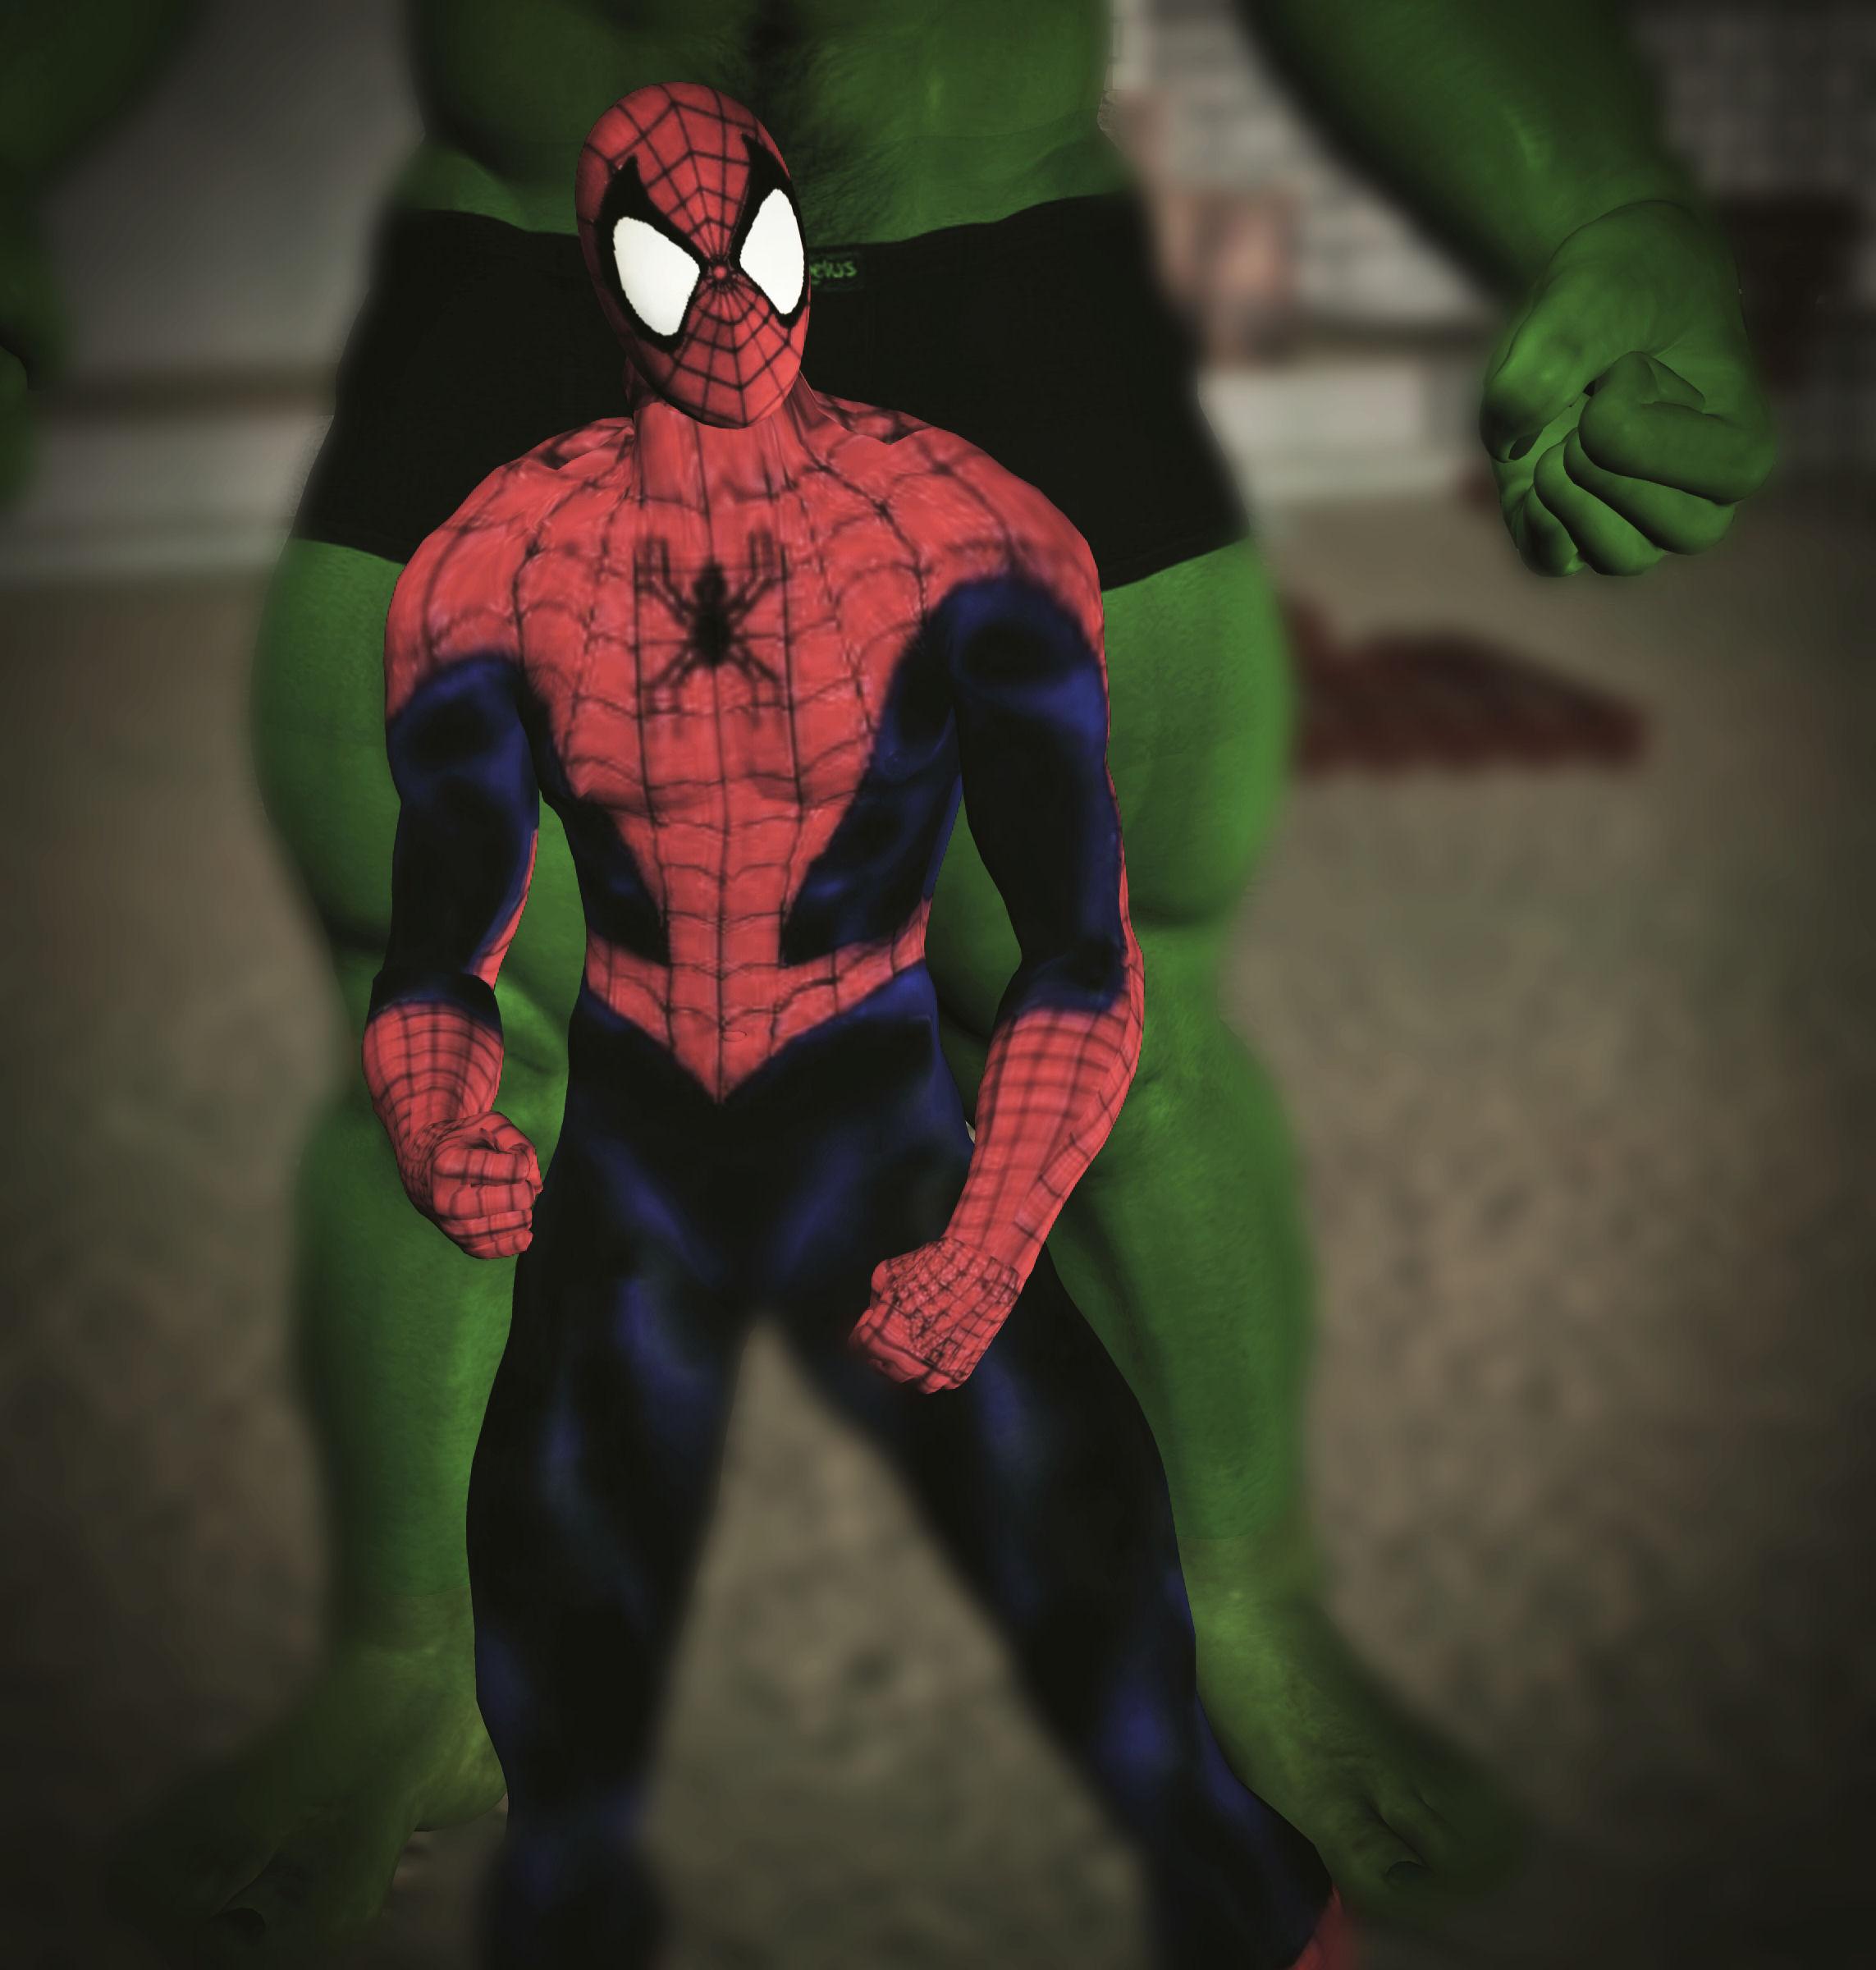 what?! The Hulk! Where?